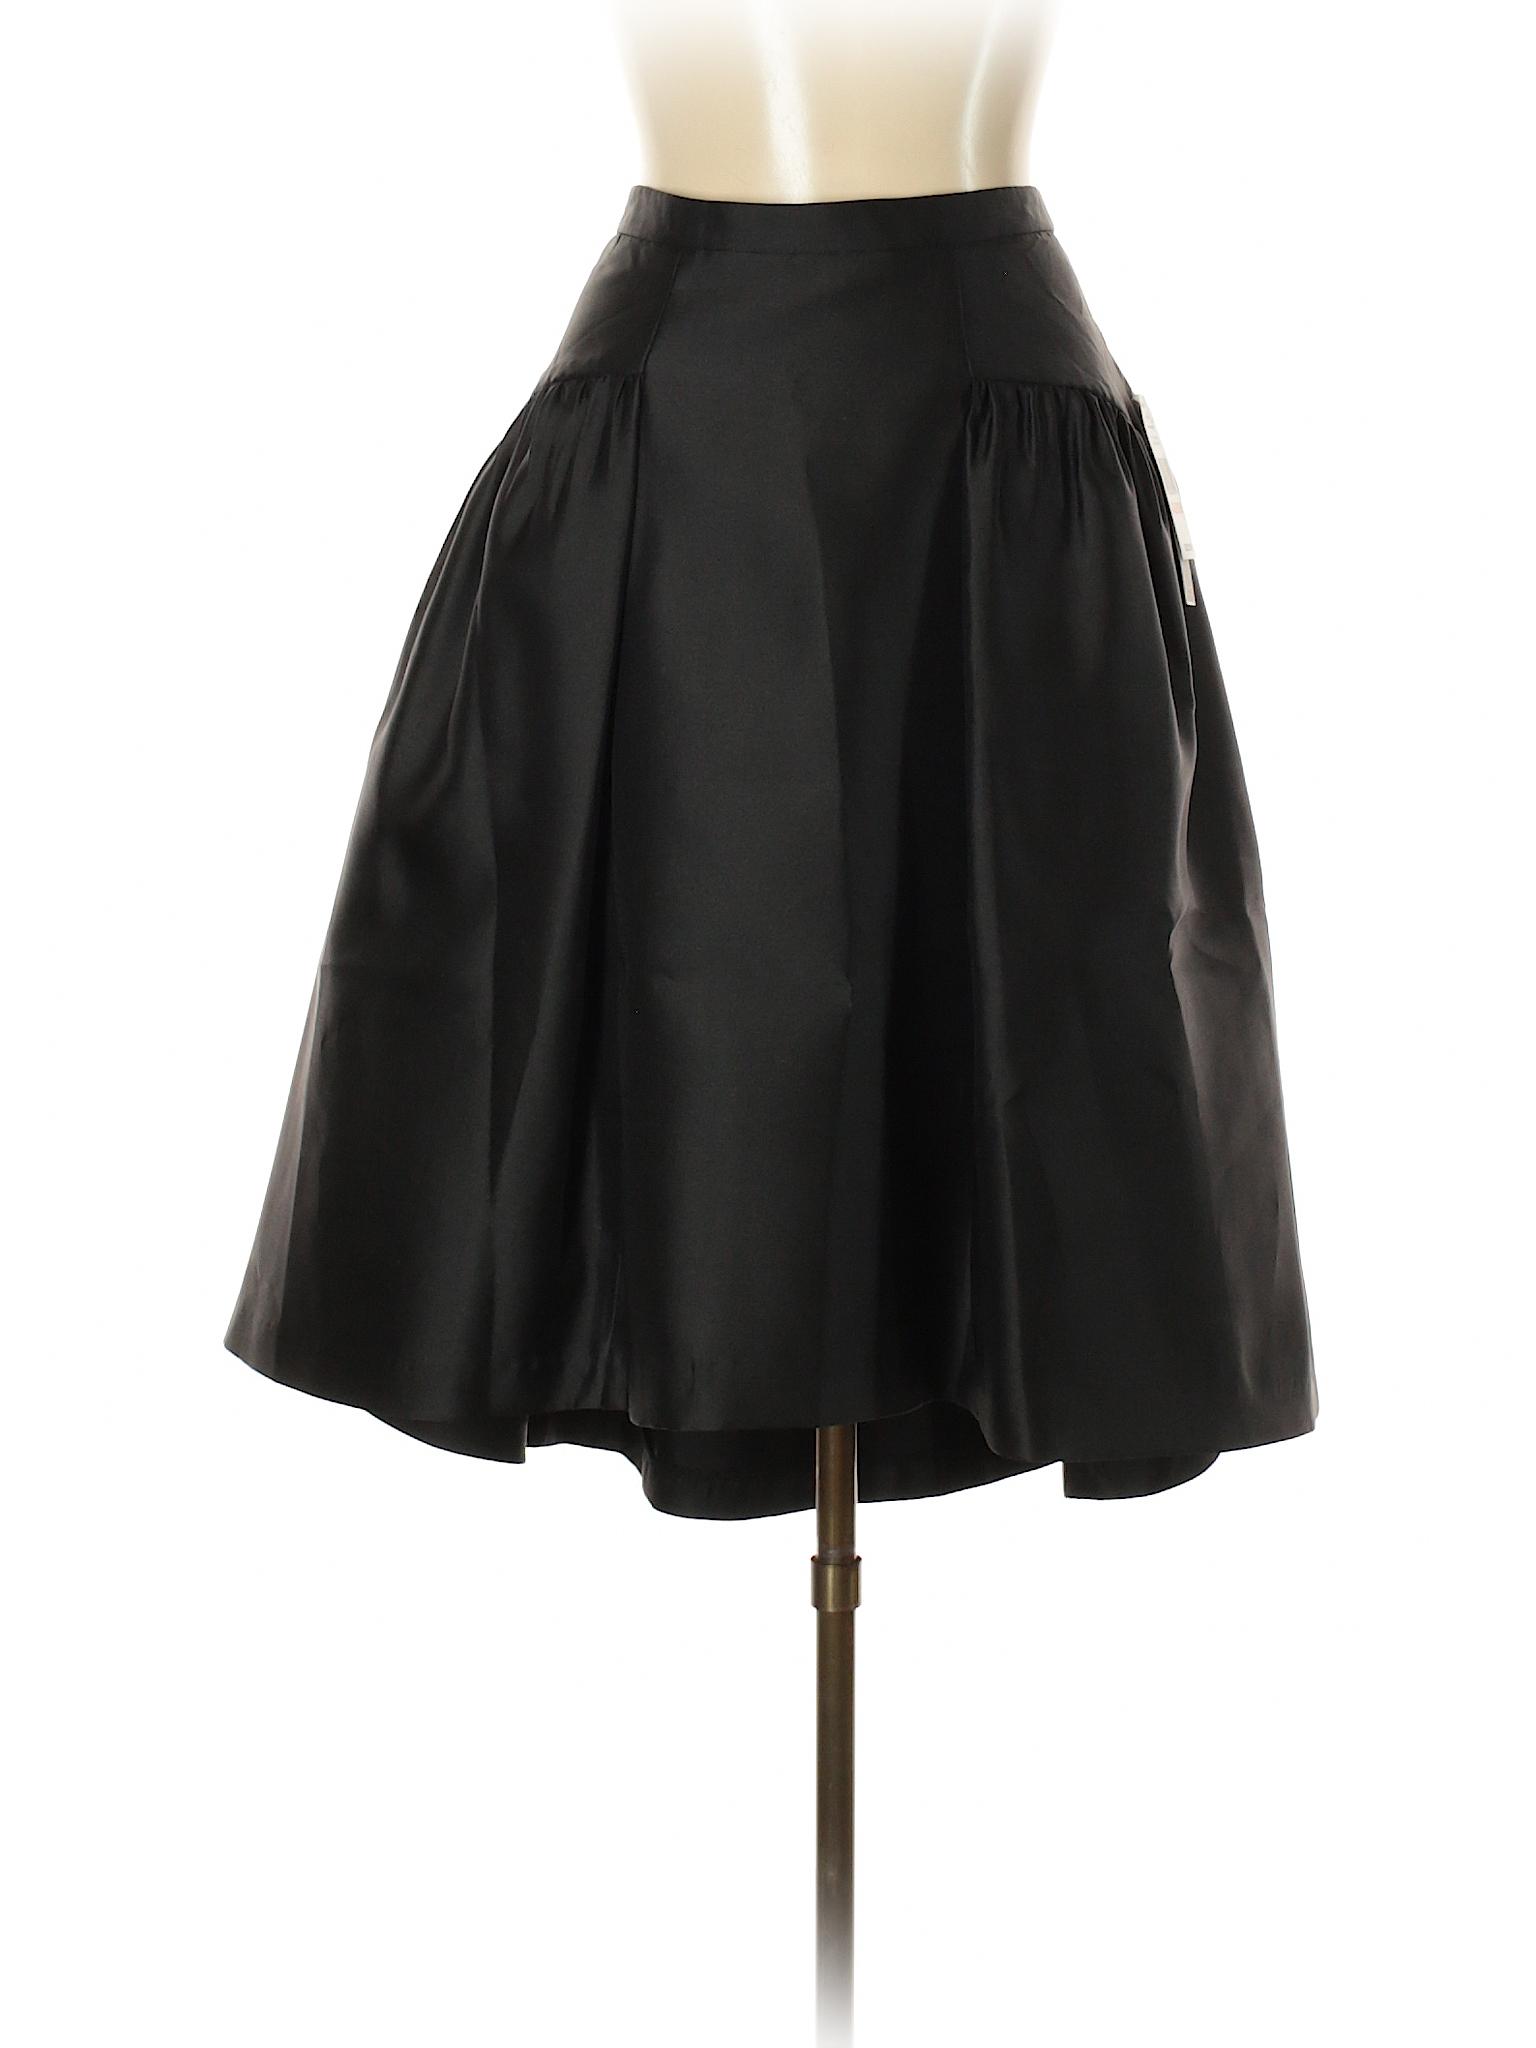 Formal Formal Boutique Skirt Boutique Skirt Boutique xgffOqwZ